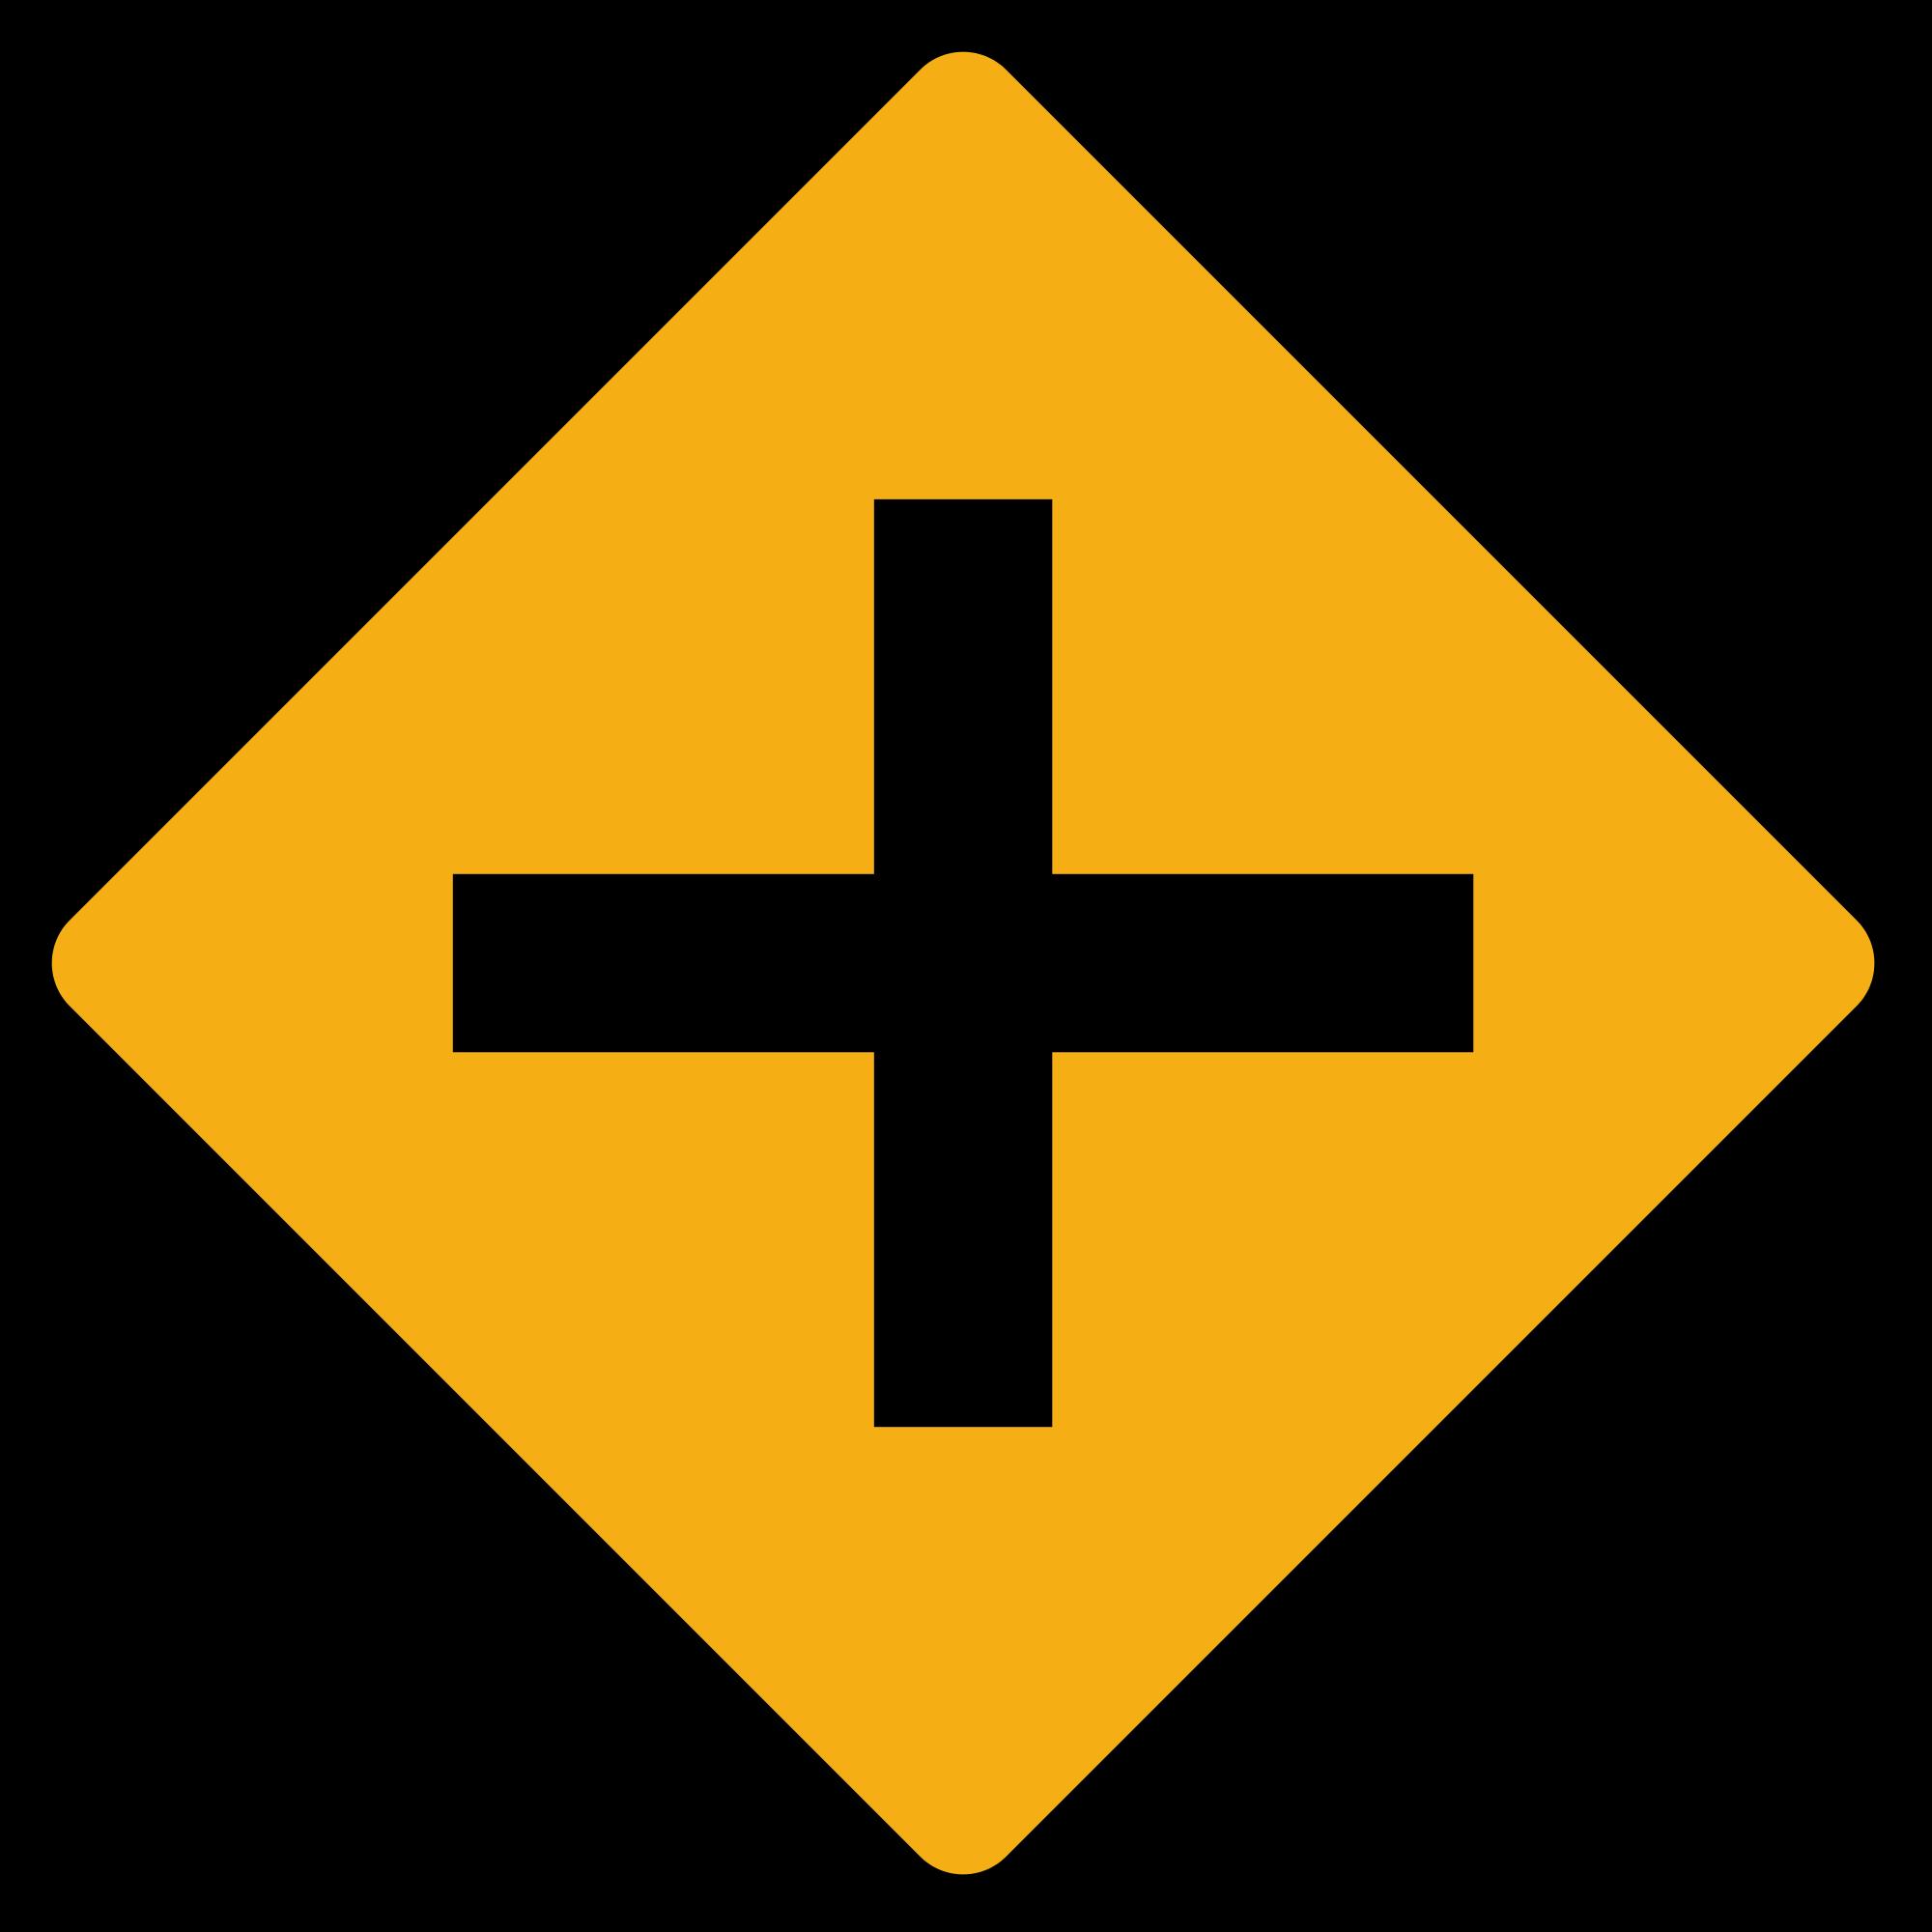 Cross roads clipart clip transparent download File:Diamond road sign junction crossroads.svg - Wikimedia Commons clip transparent download